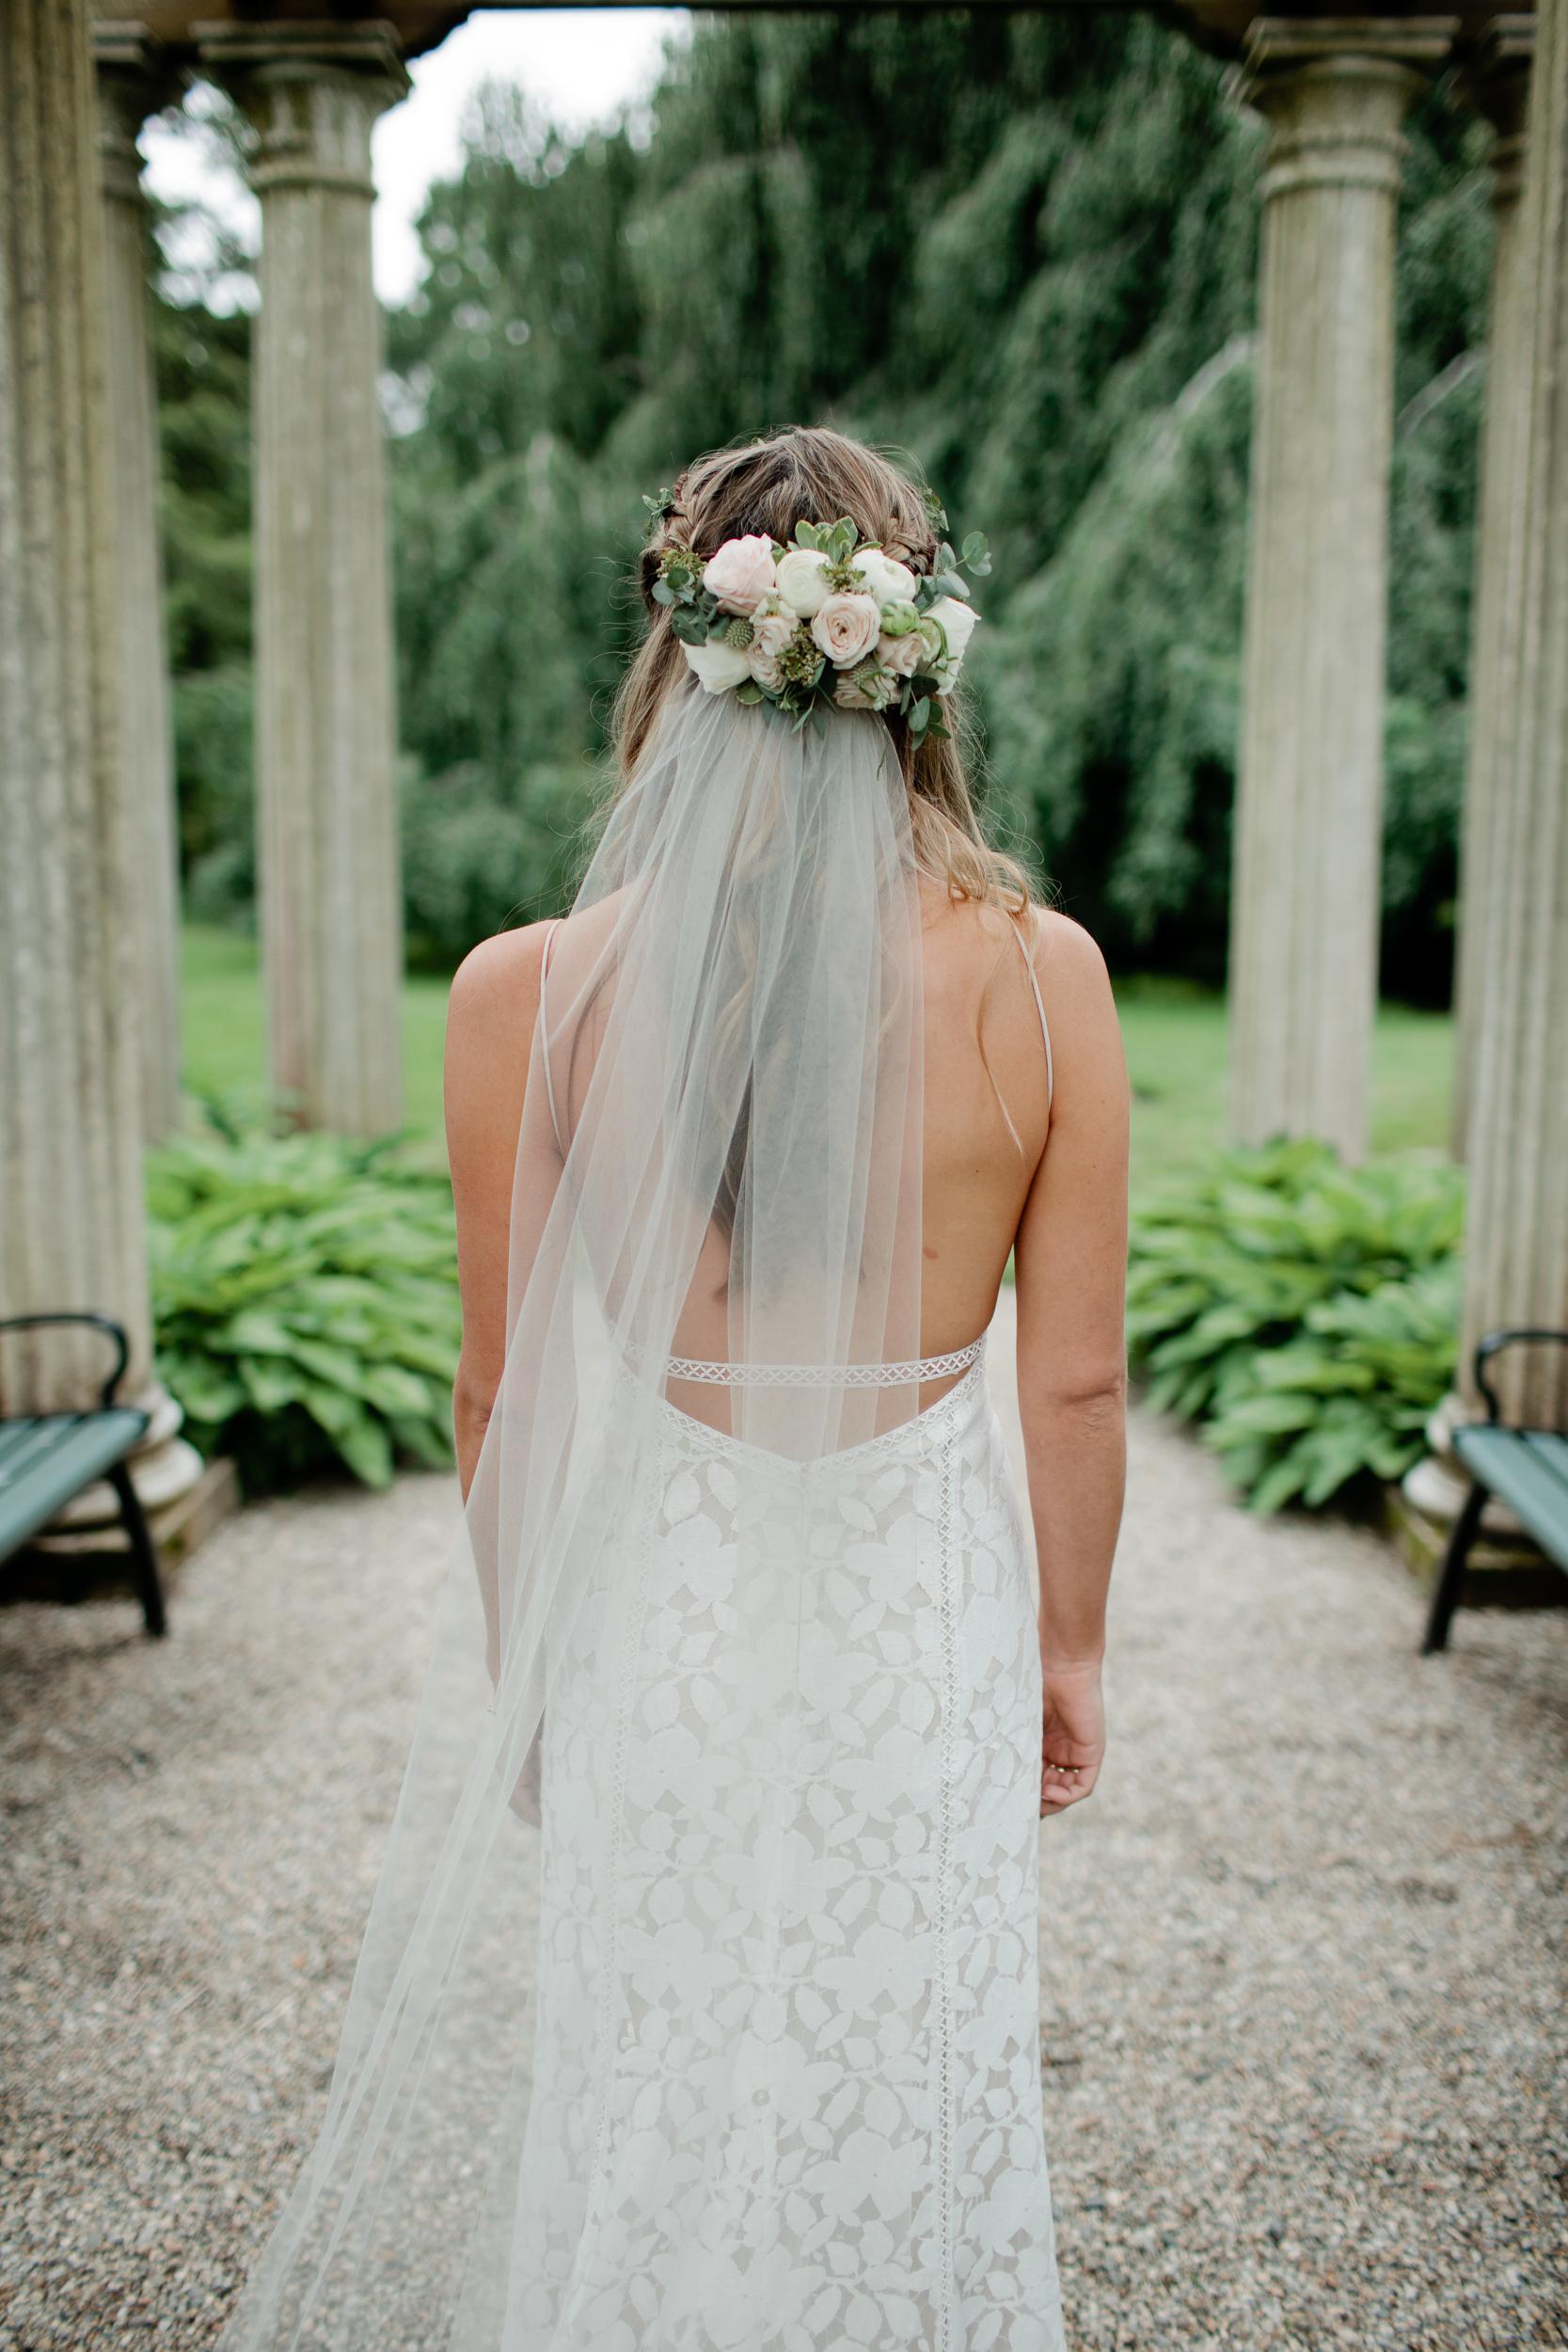 Best-Maine-Wedding-Photographer-59.jpg